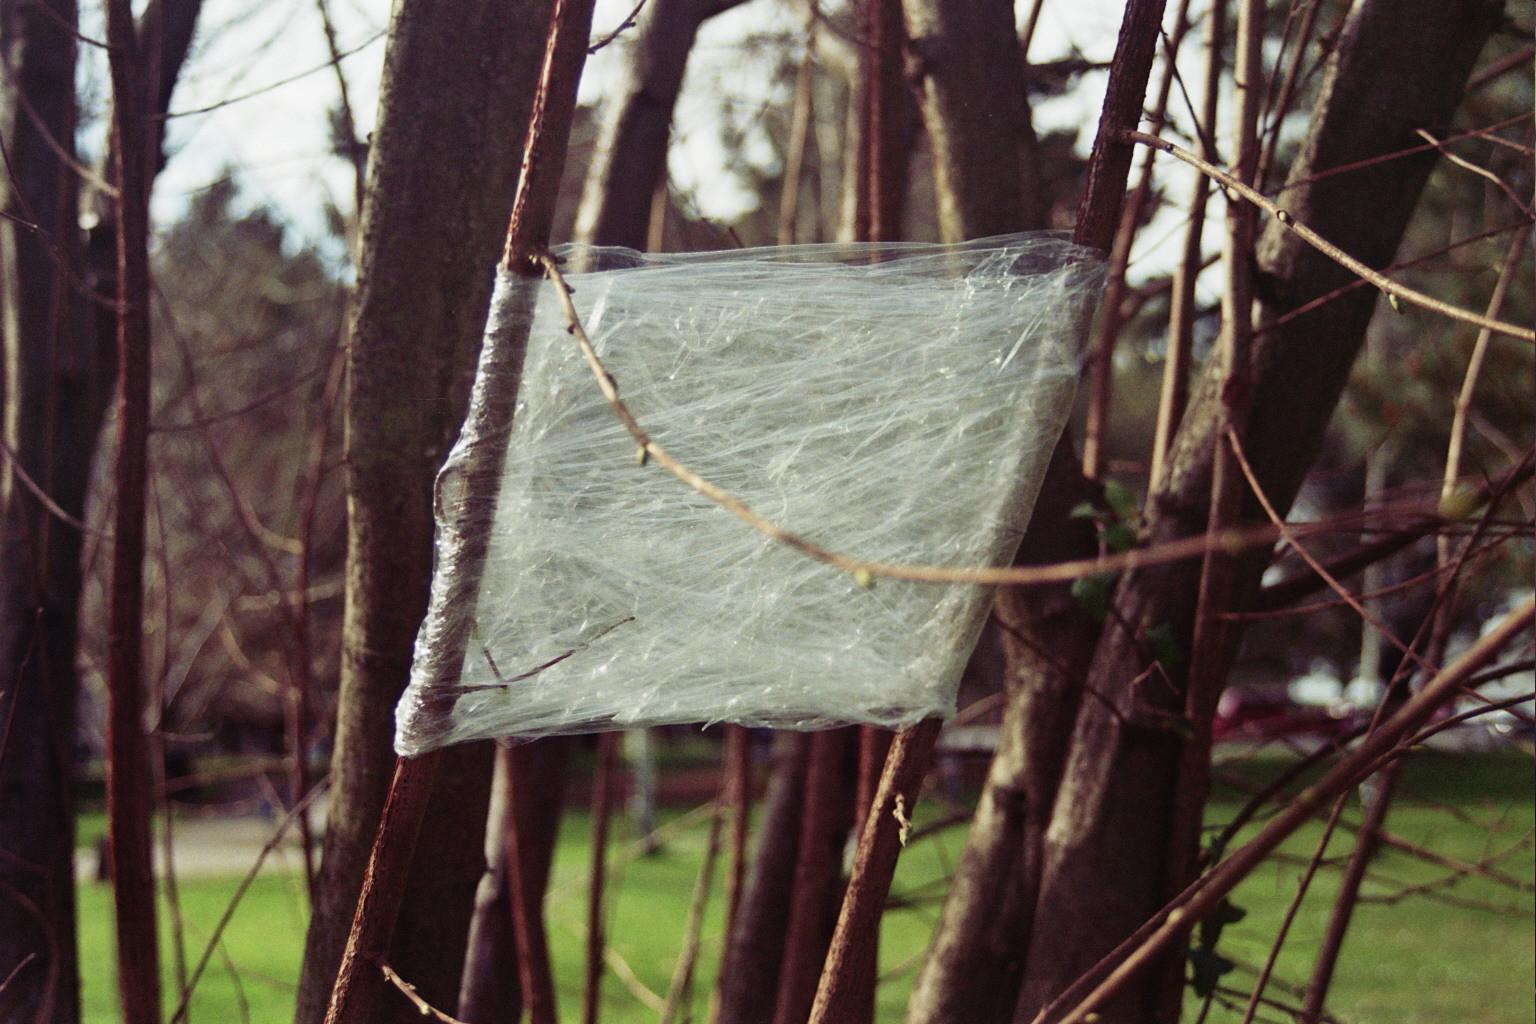 Prueba en árbol (4).jpg